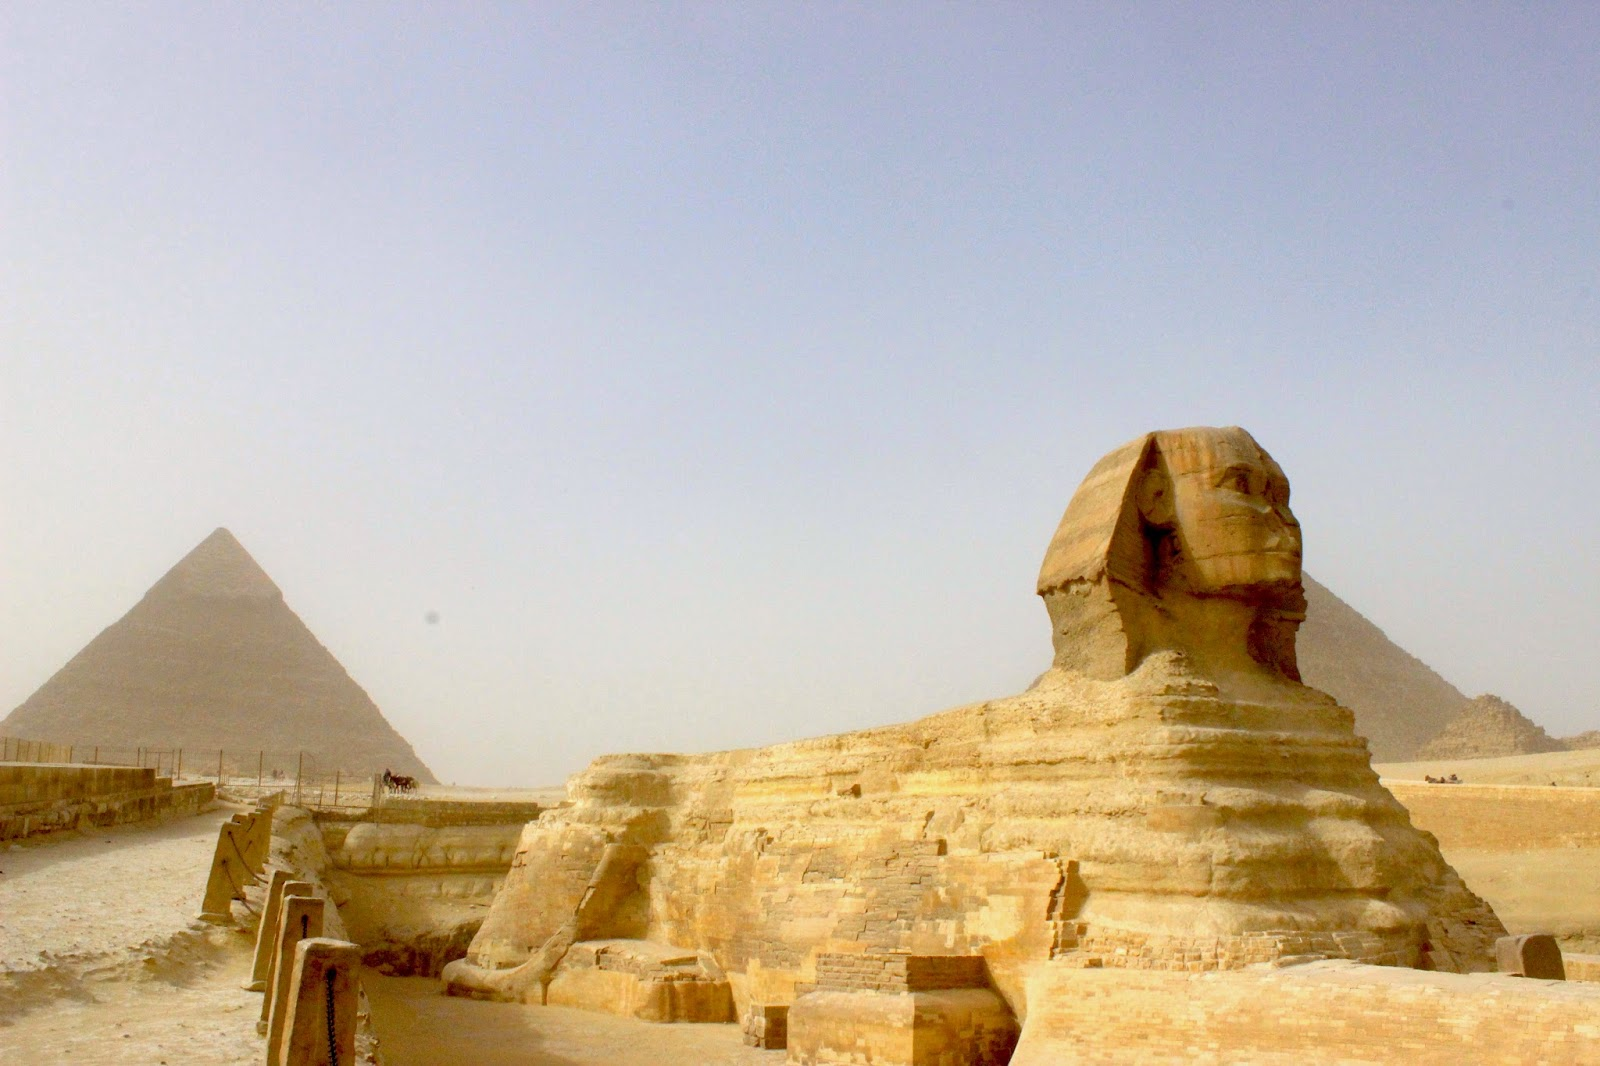 Sphinx dan Pyramid di Giza, Cairo, Mesir